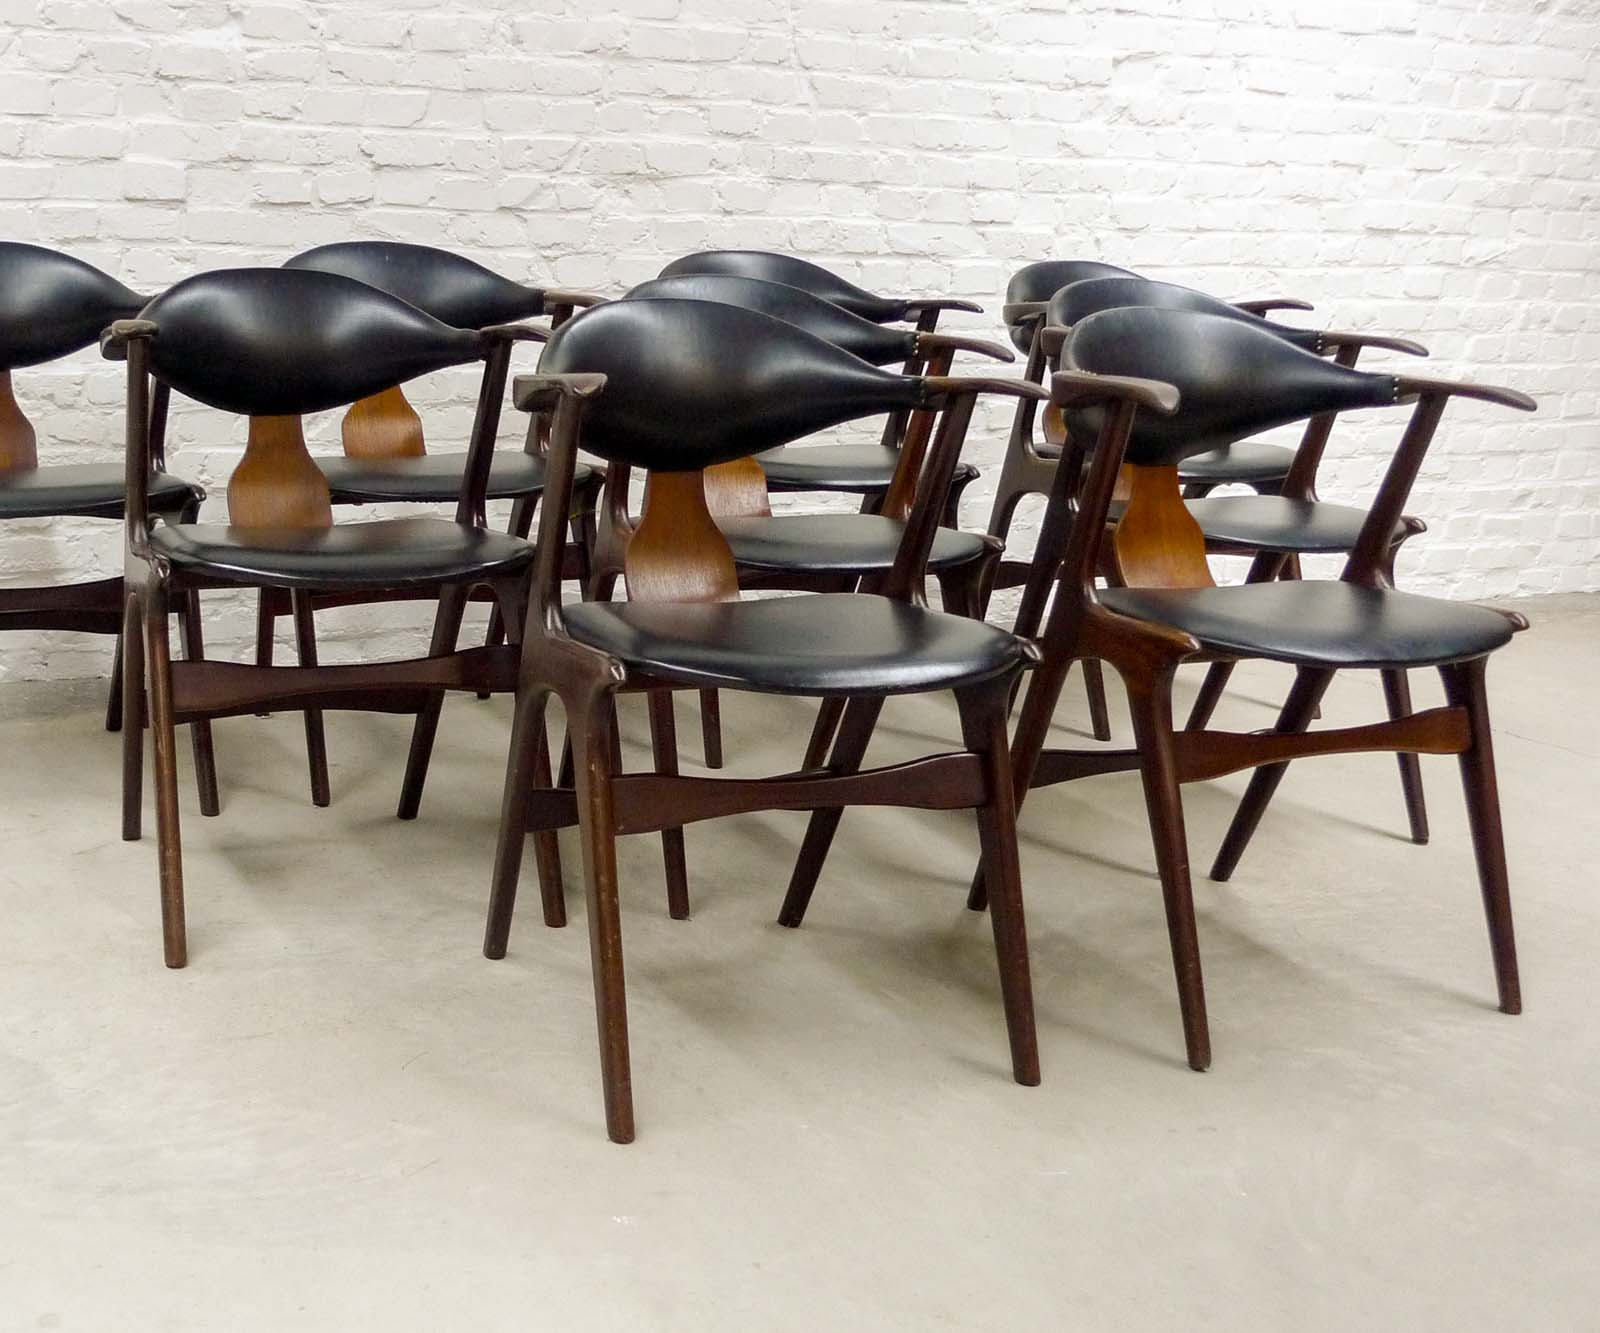 Dutch Design Cow Horn Dining Chairs By Louis Van Teeffelen For AWA, Set Of  Nine